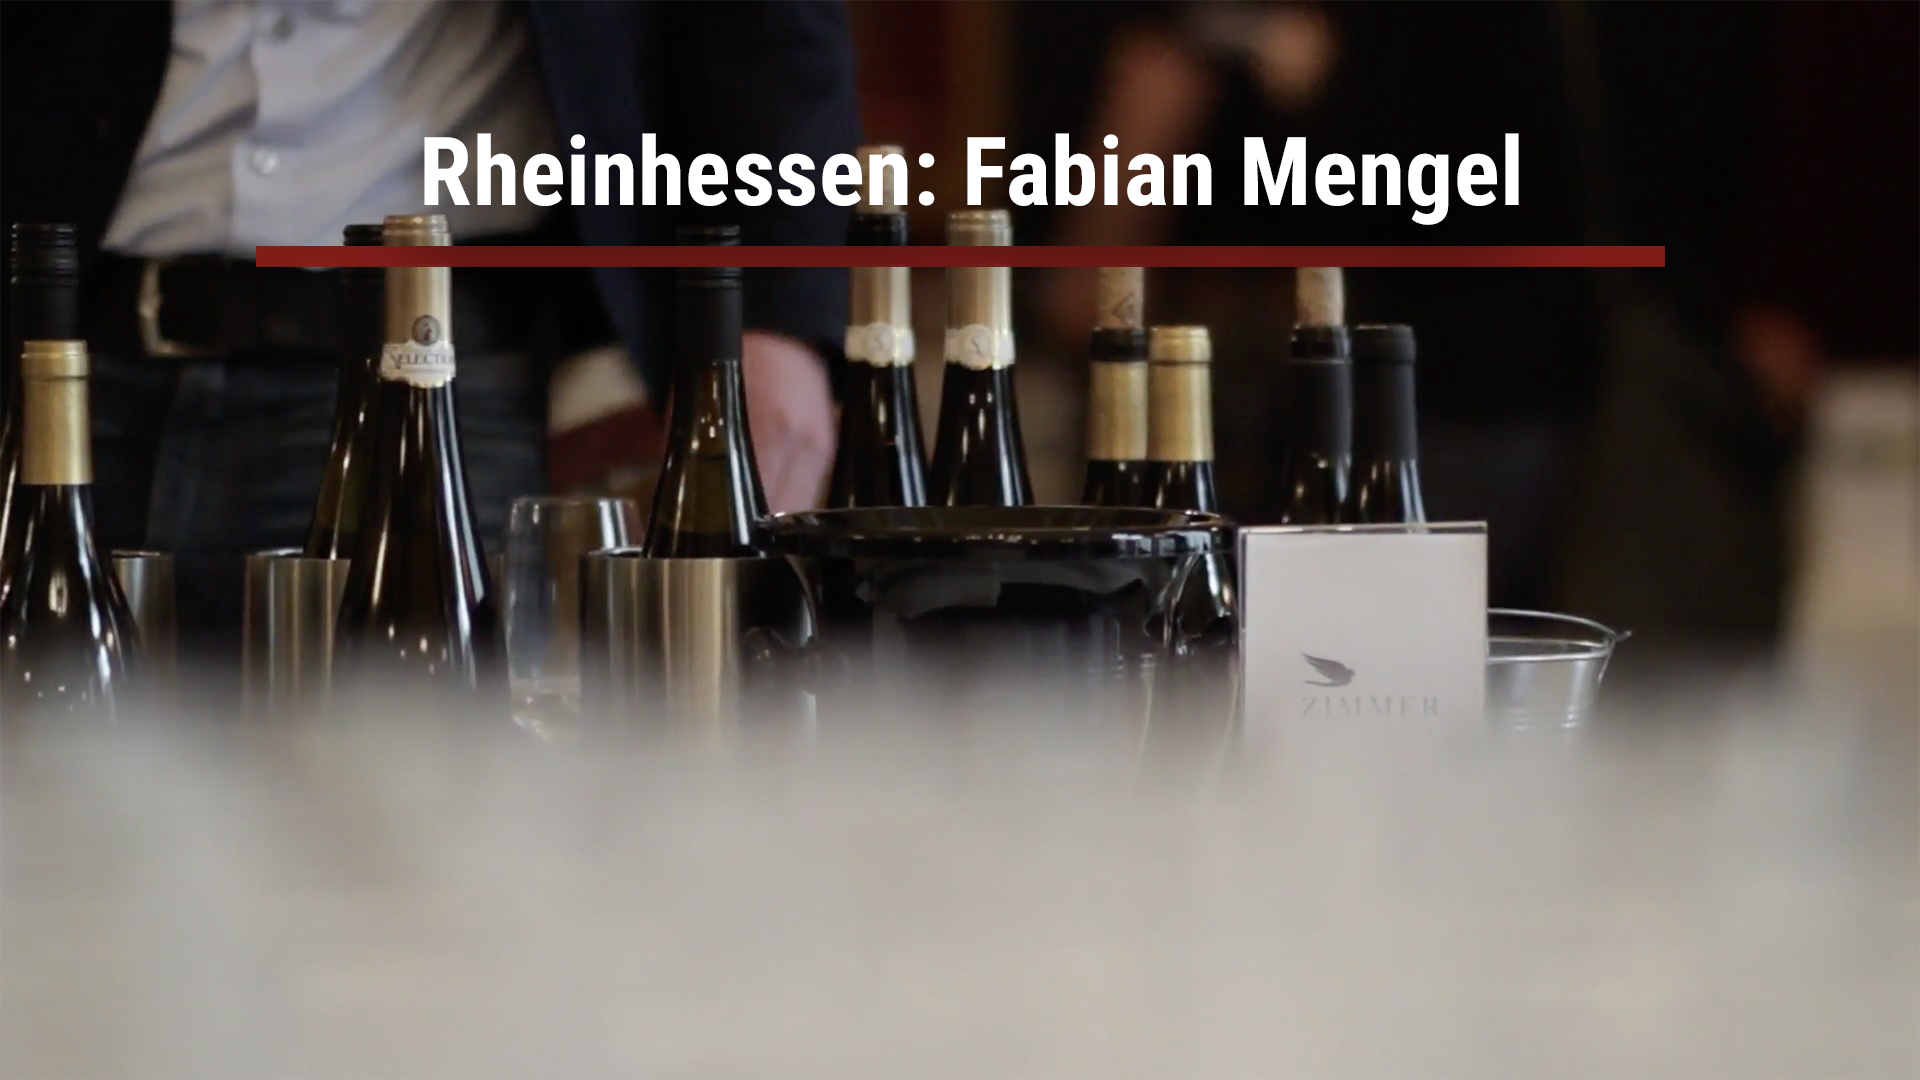 Rheinhessen: Fabian Mengel